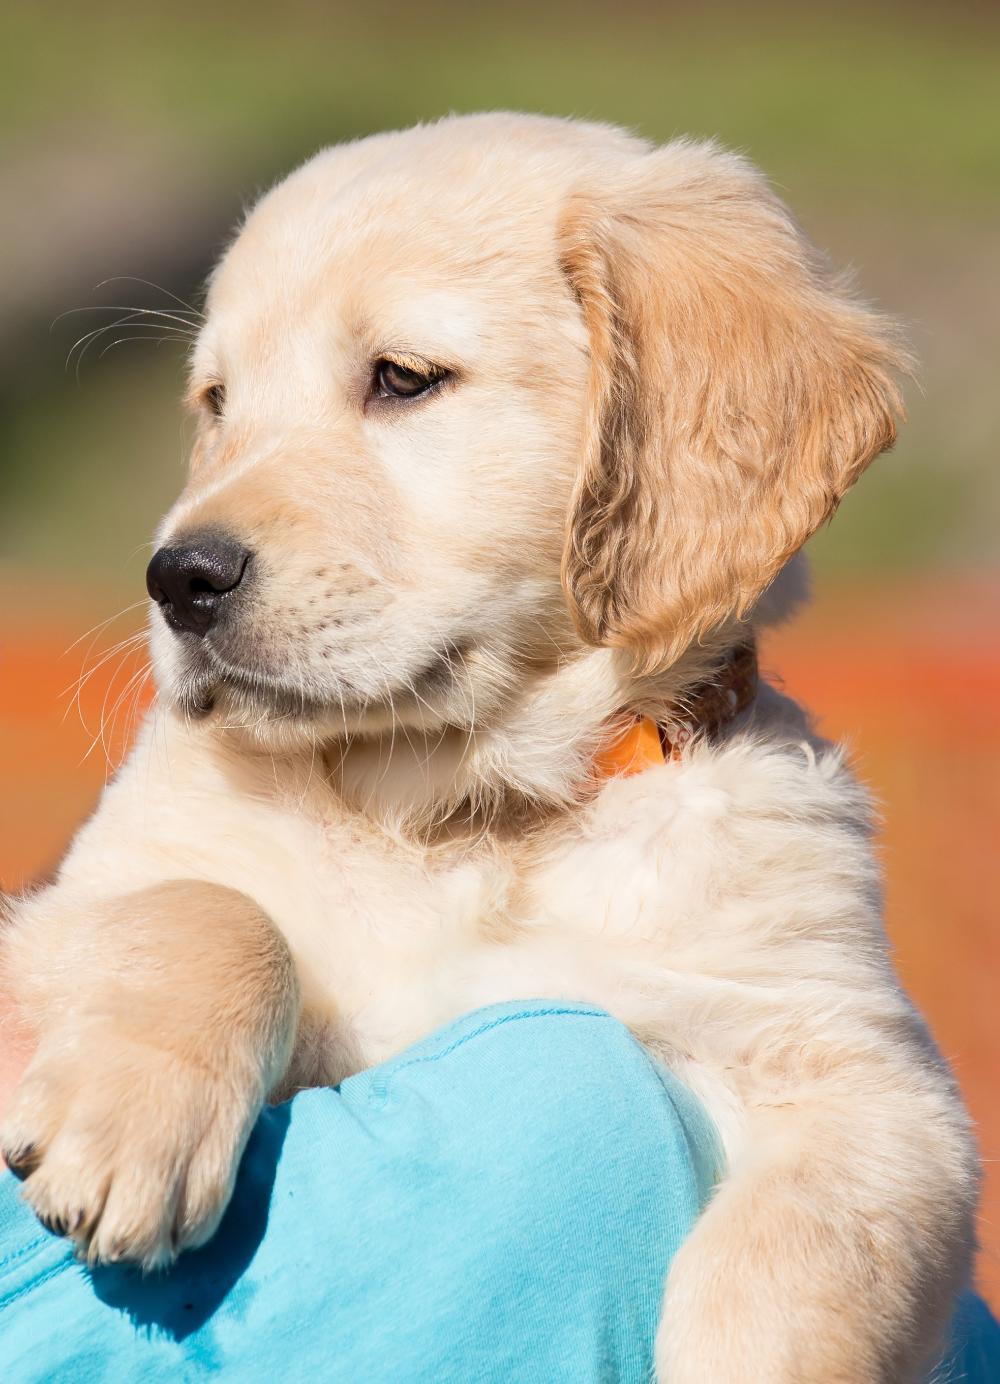 Snap & stitch in 2020 Puppies, Golden retriever, Dogs